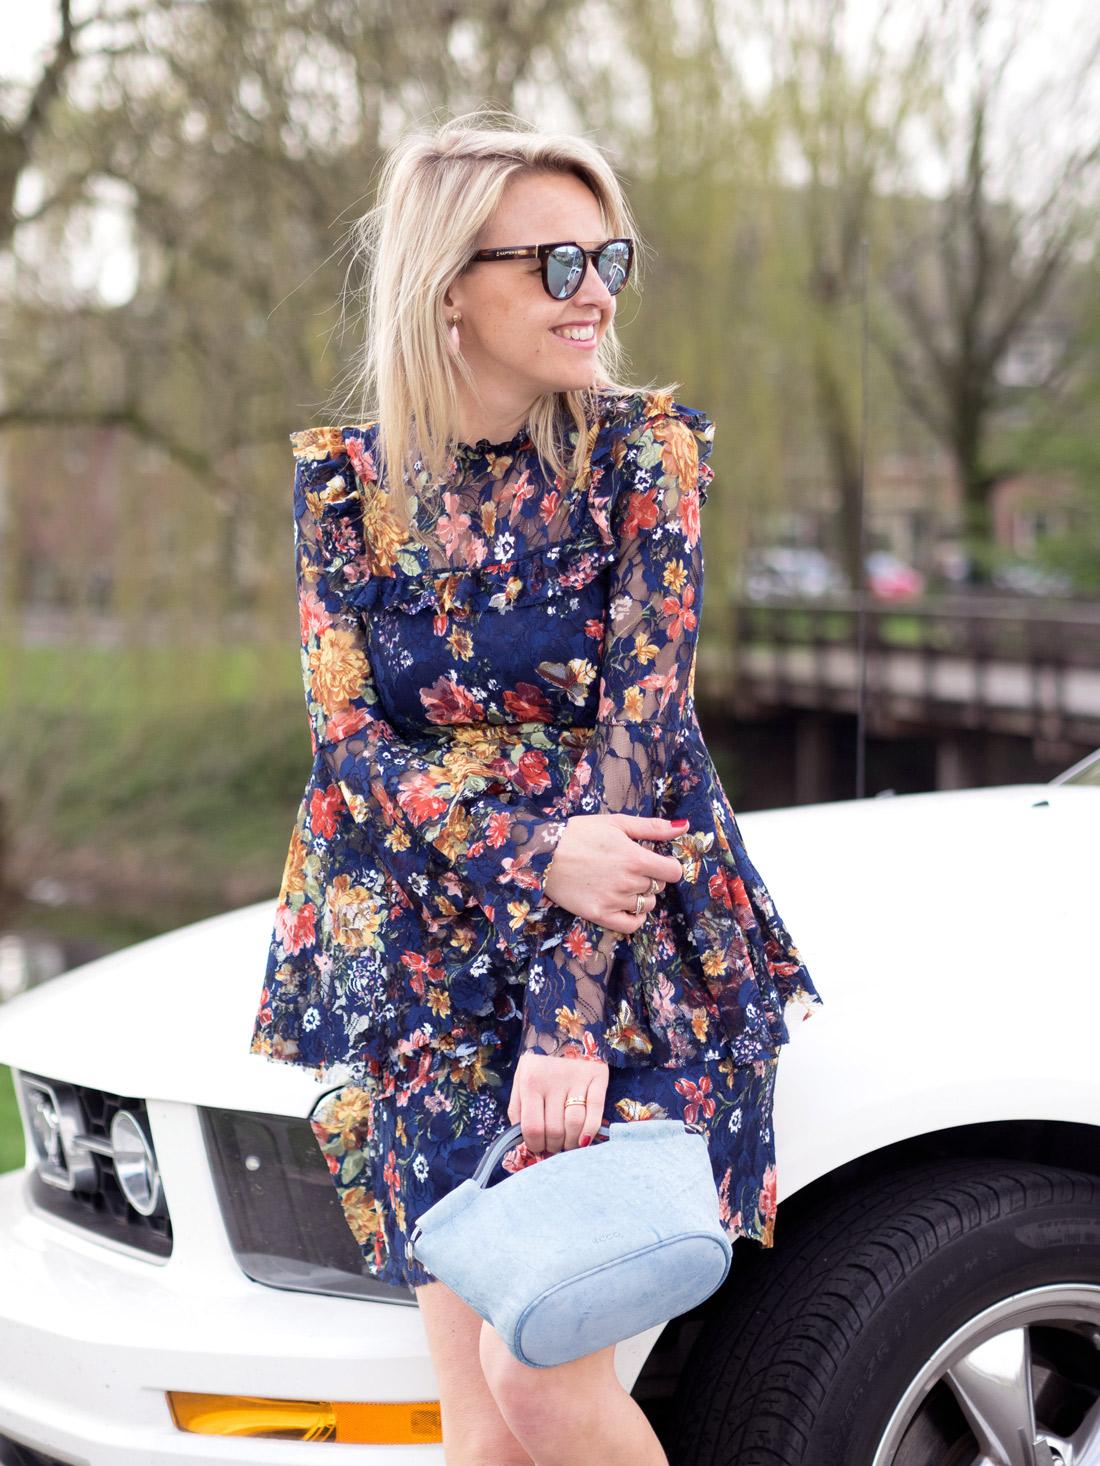 BAG-AT-YOU_Susanne_Bavinck_Bender_Blogger_Fashion_Amsterdam_By_Marinke_Davelaar-Ecco-handbag